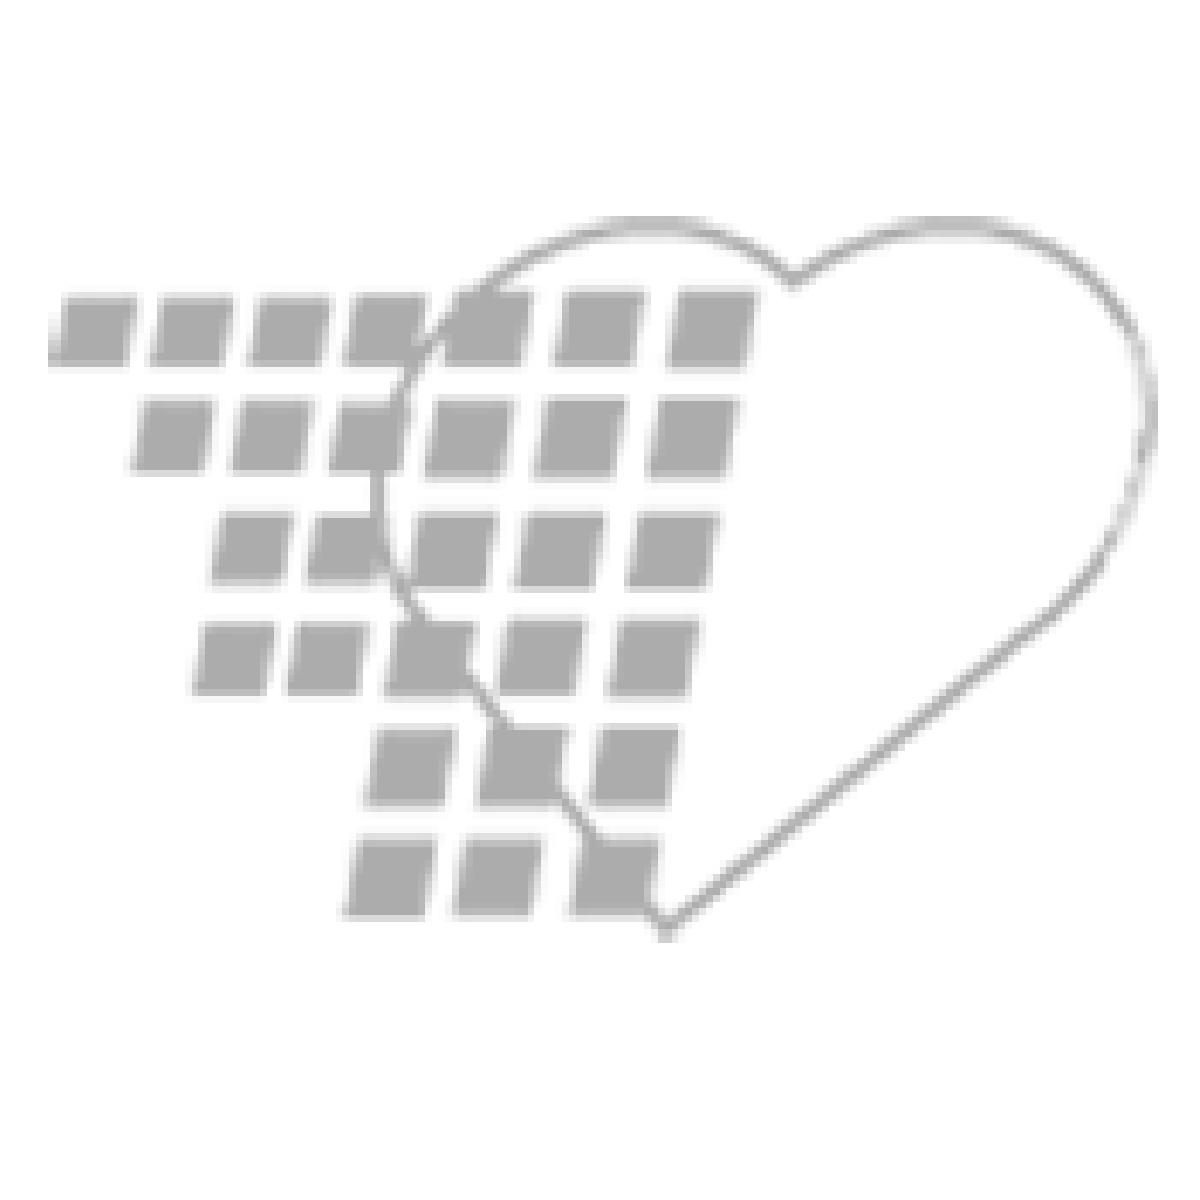 06-93-0412 Demo Dose® Sodim Chlorid 100mL 4mEq/mL 100 mL